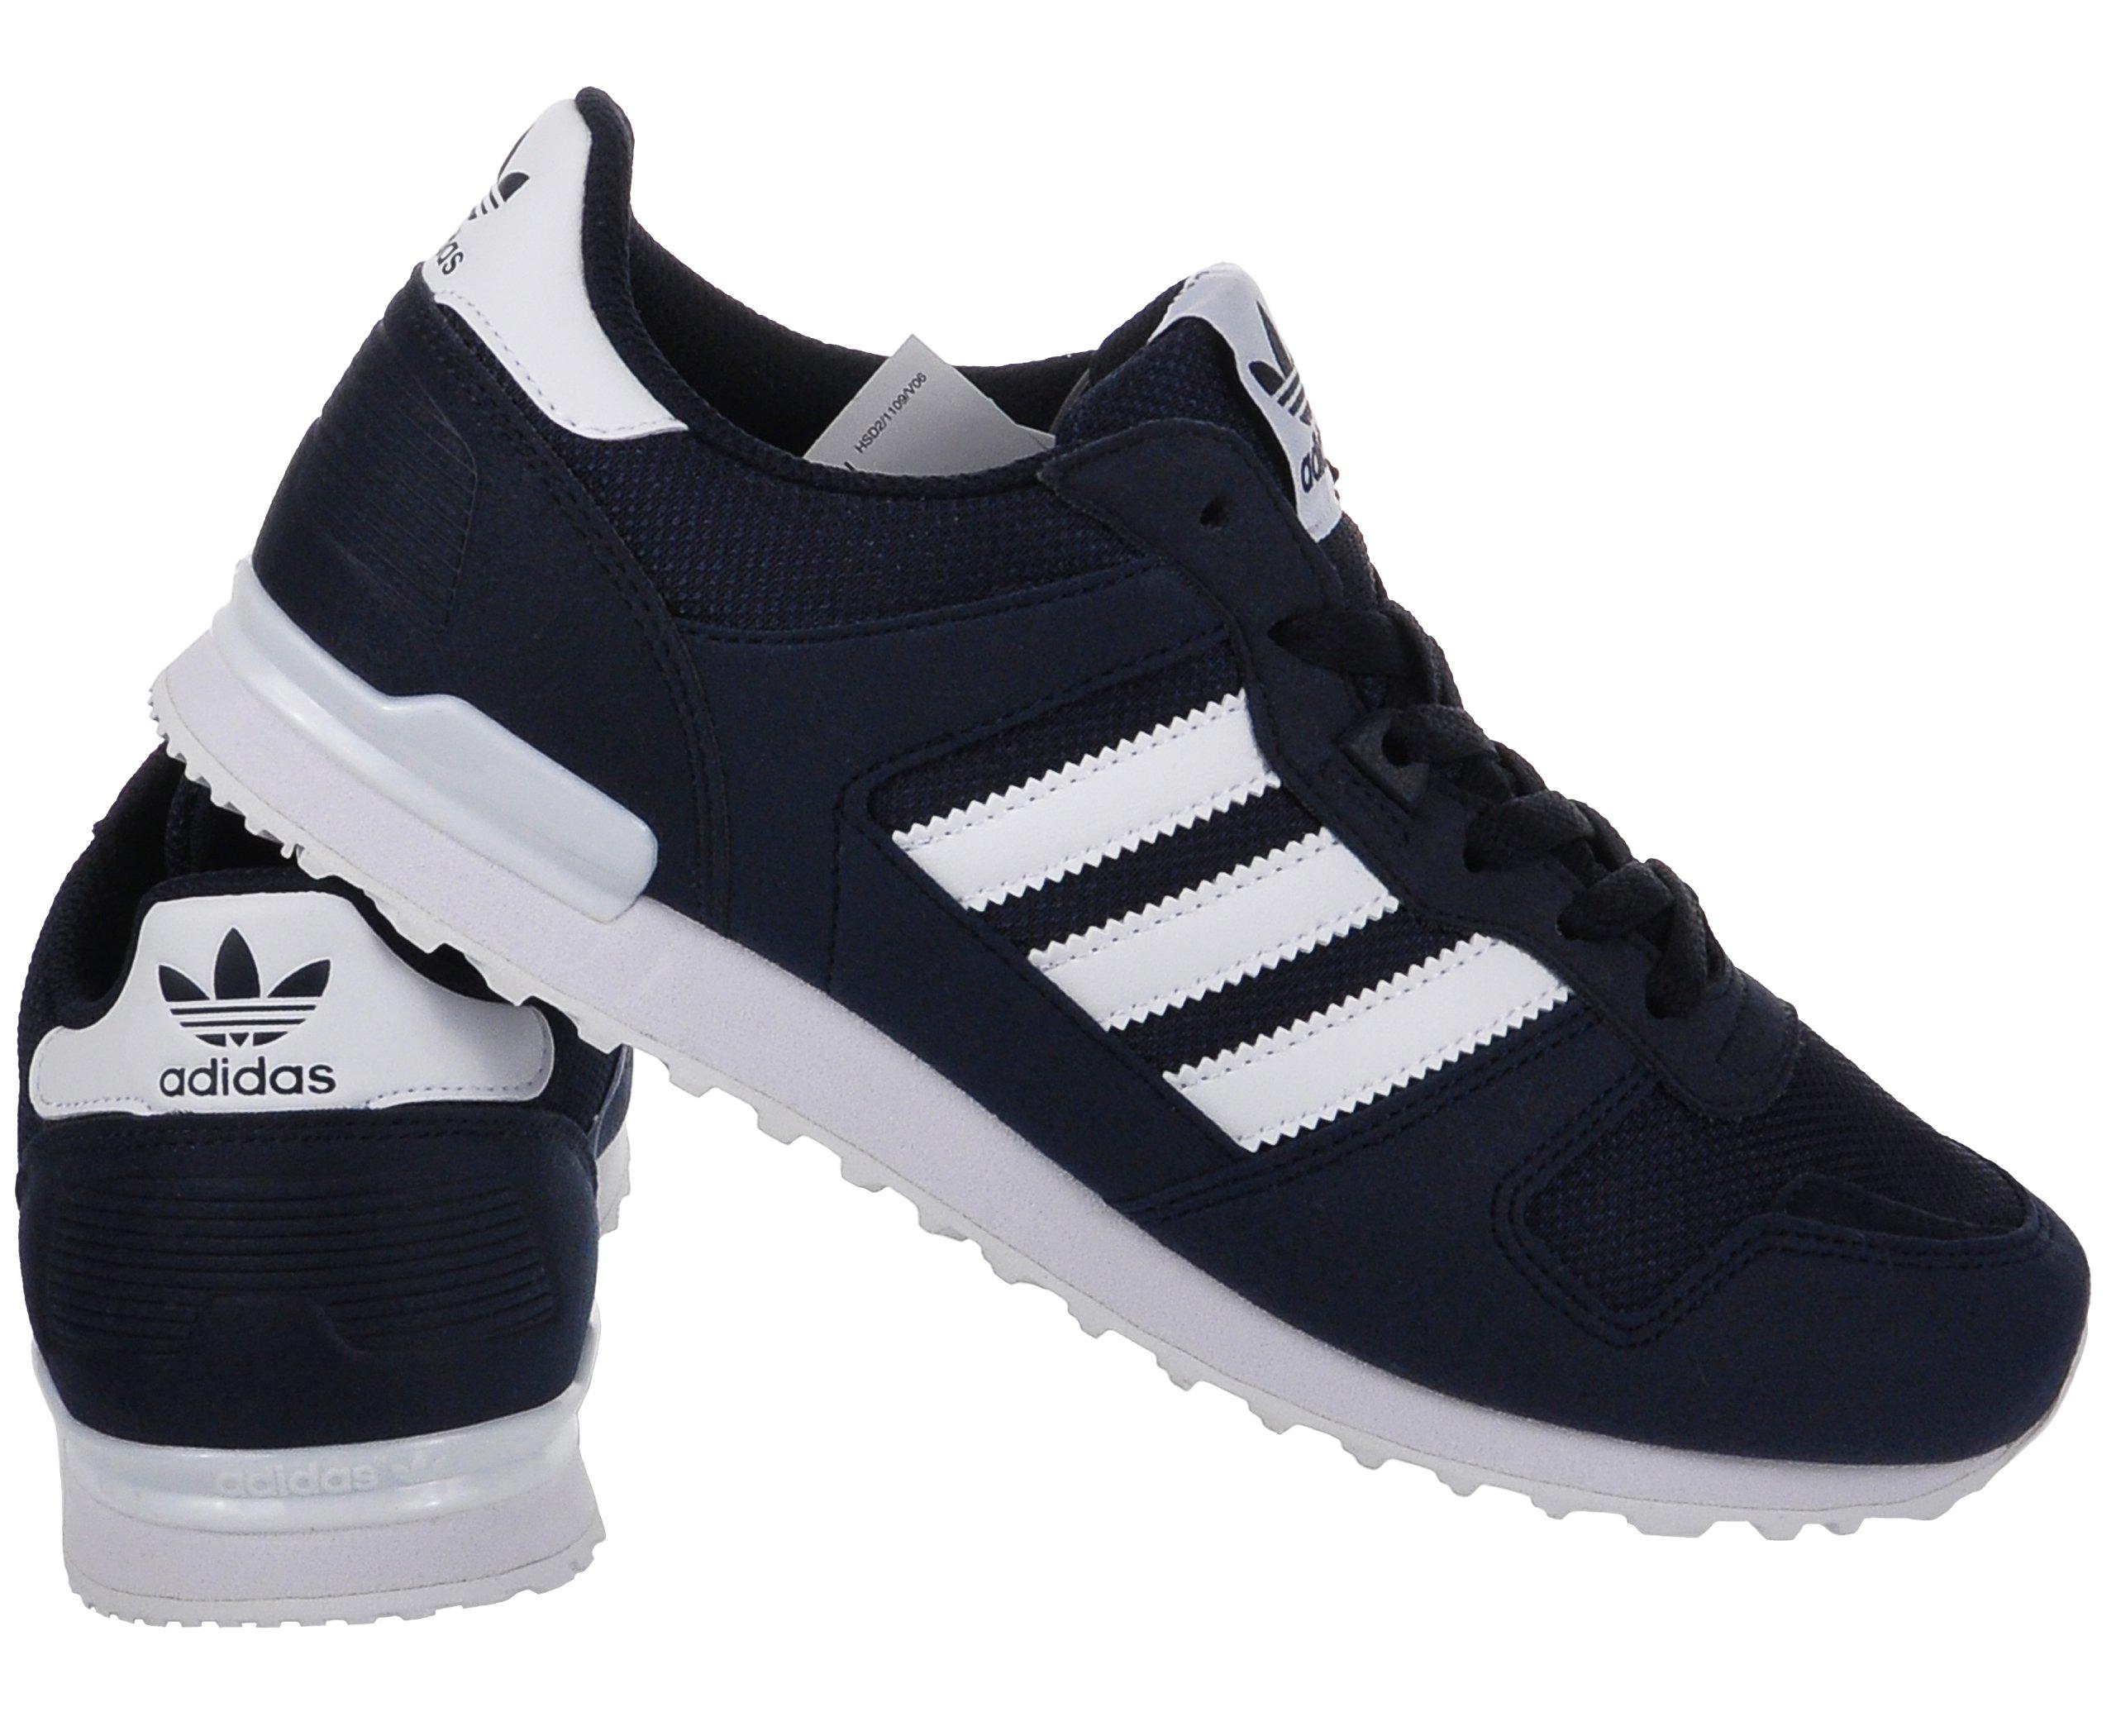 zx 700 nike air buty adidas damskie